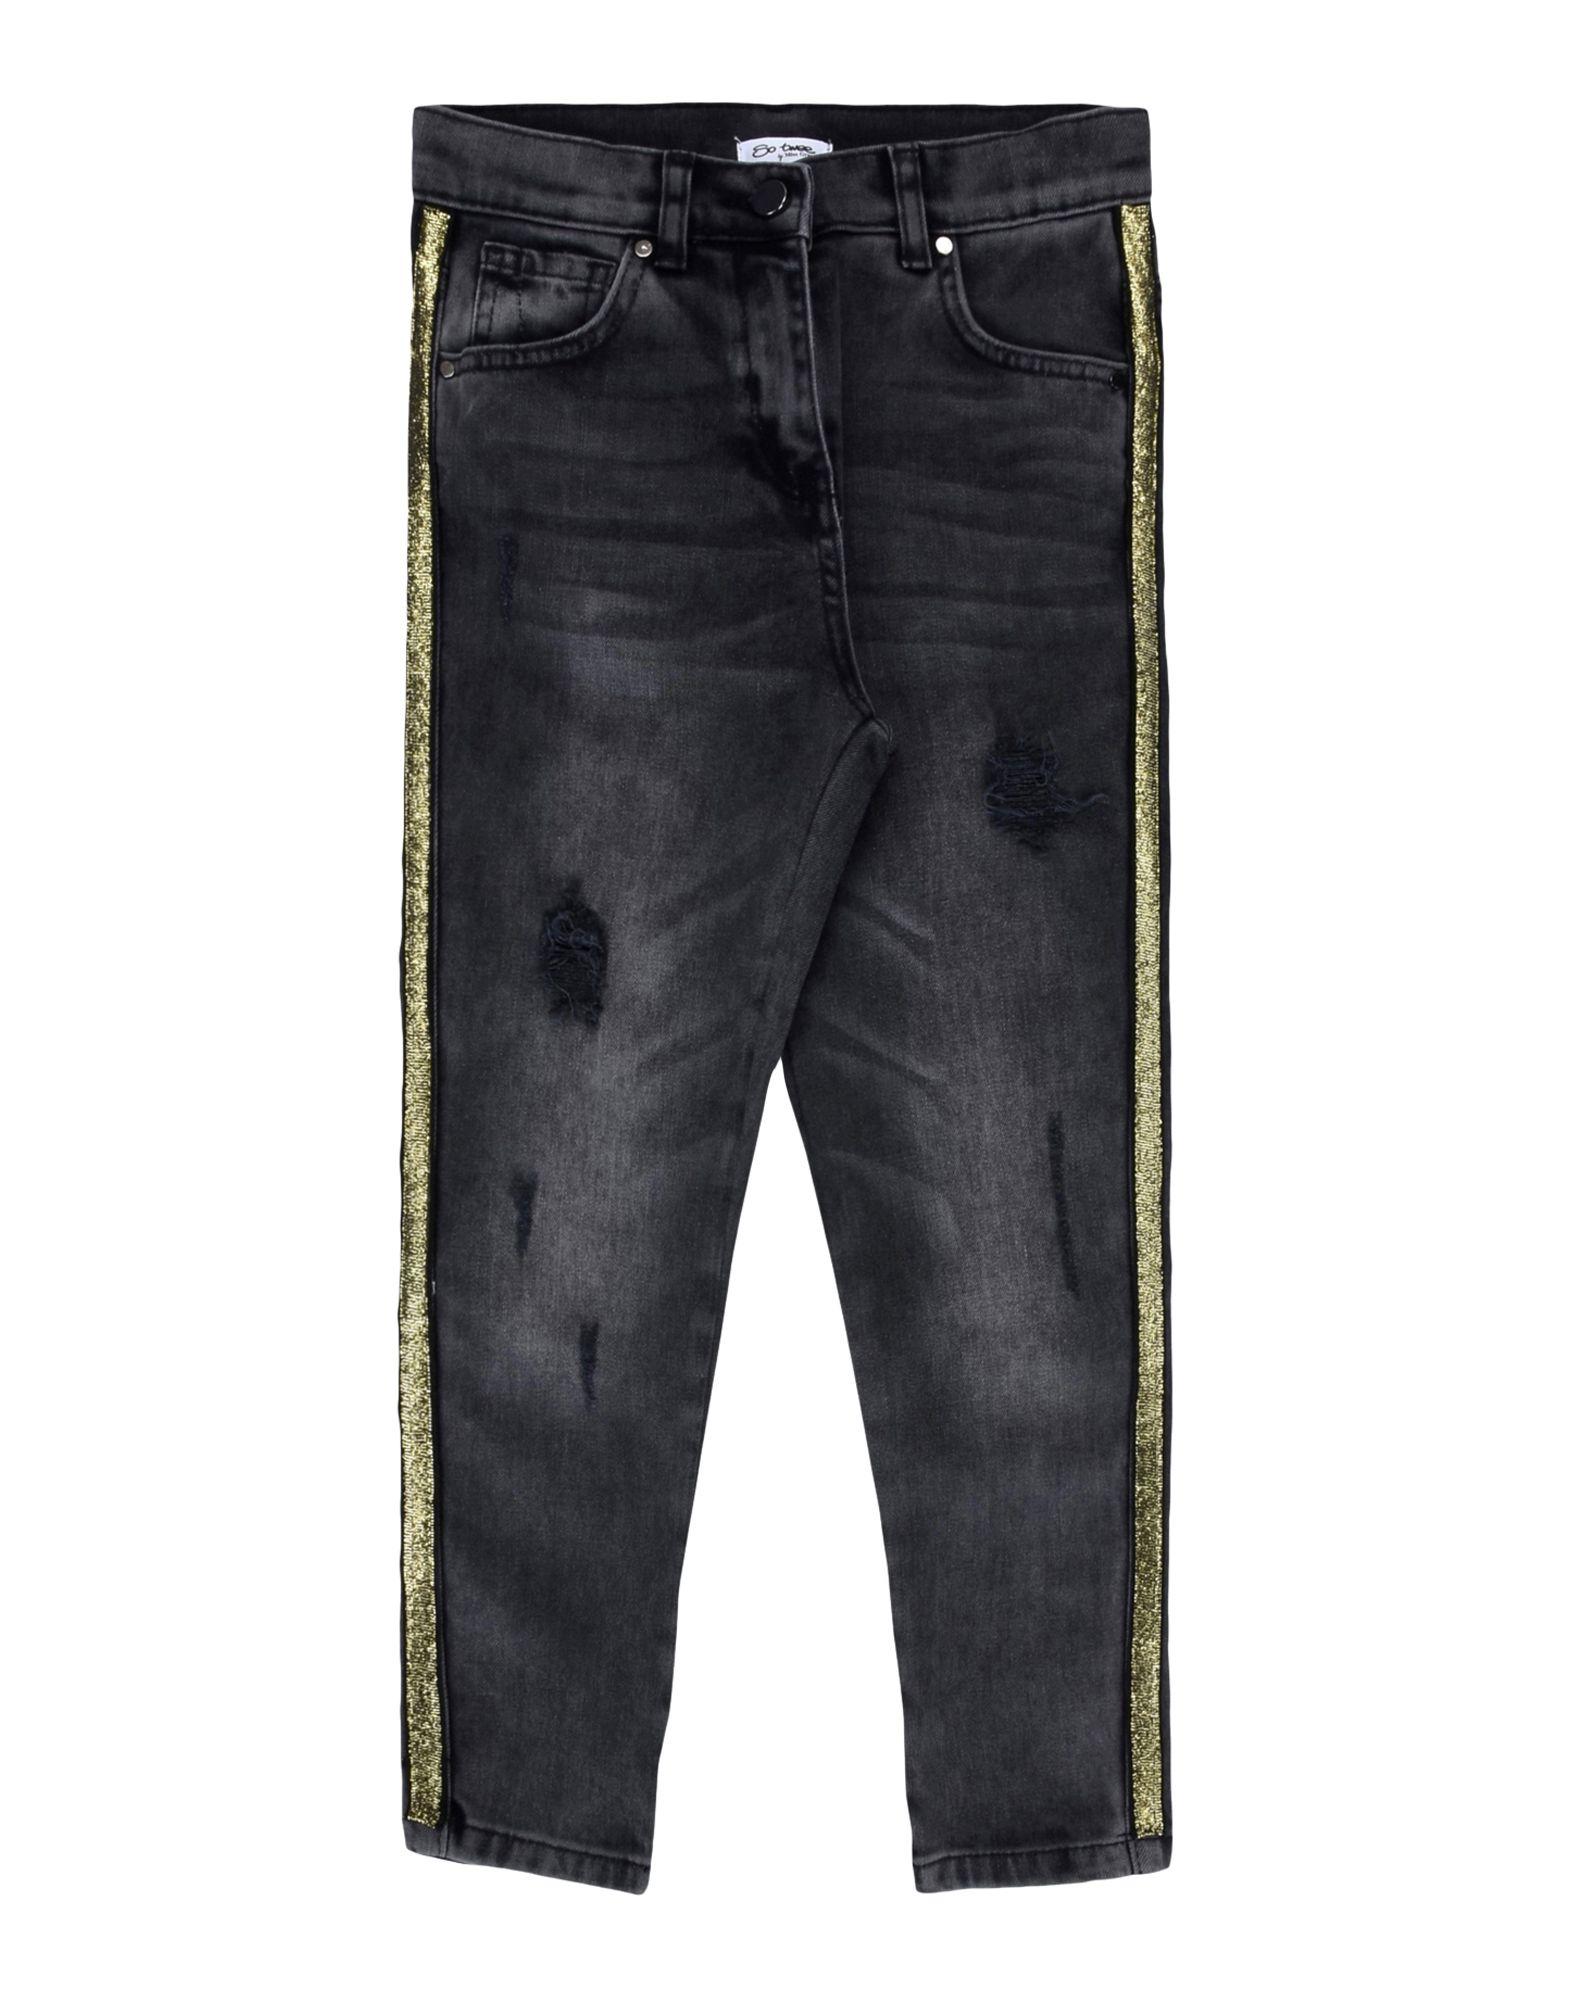 SO TWEE by MISS GRANT Джинсовые брюки